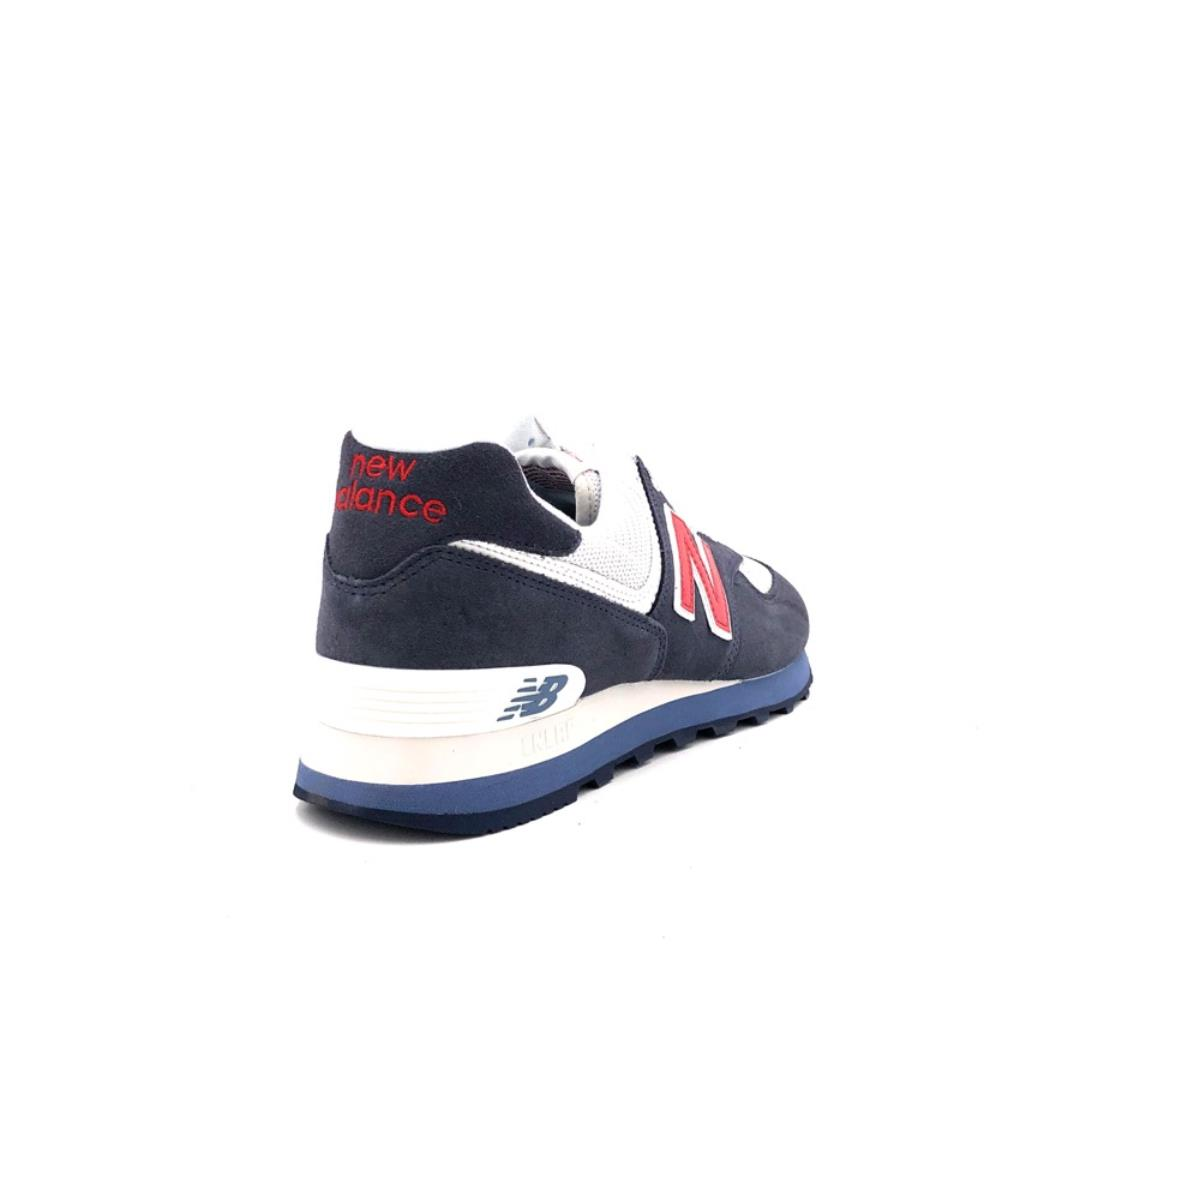 separation shoes 615cf 6b7ba NEW BALANCE ML574ESC